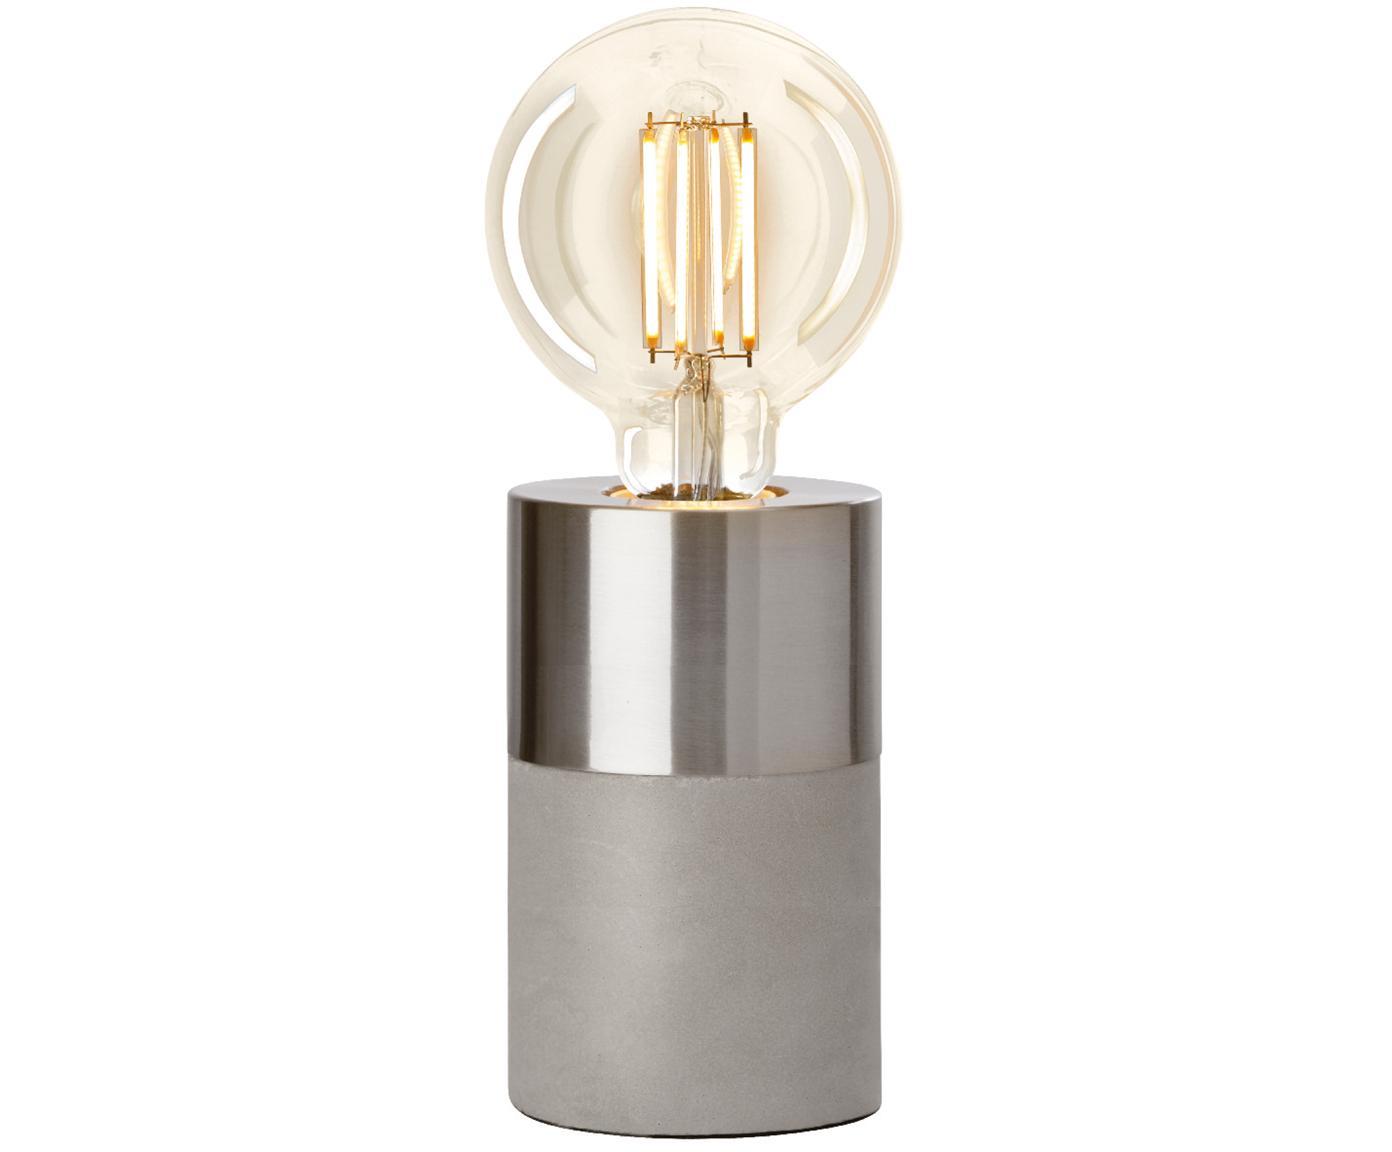 Lampada da tavolo Athen, Grigio, cromo, Ø 8 x Alt. 14 cm